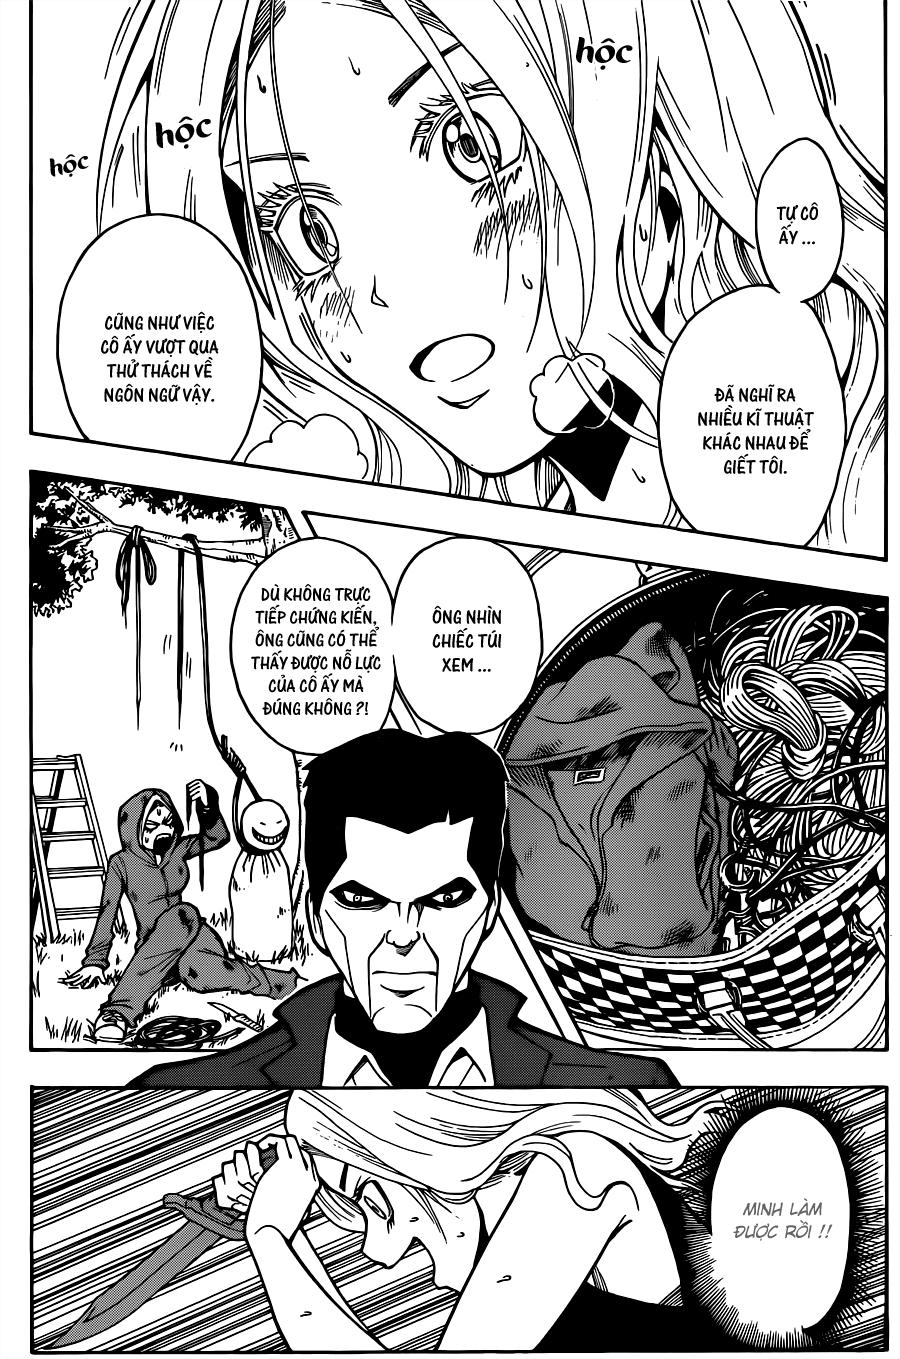 Ansatsu Kyoushitsu chap 27 trang 15